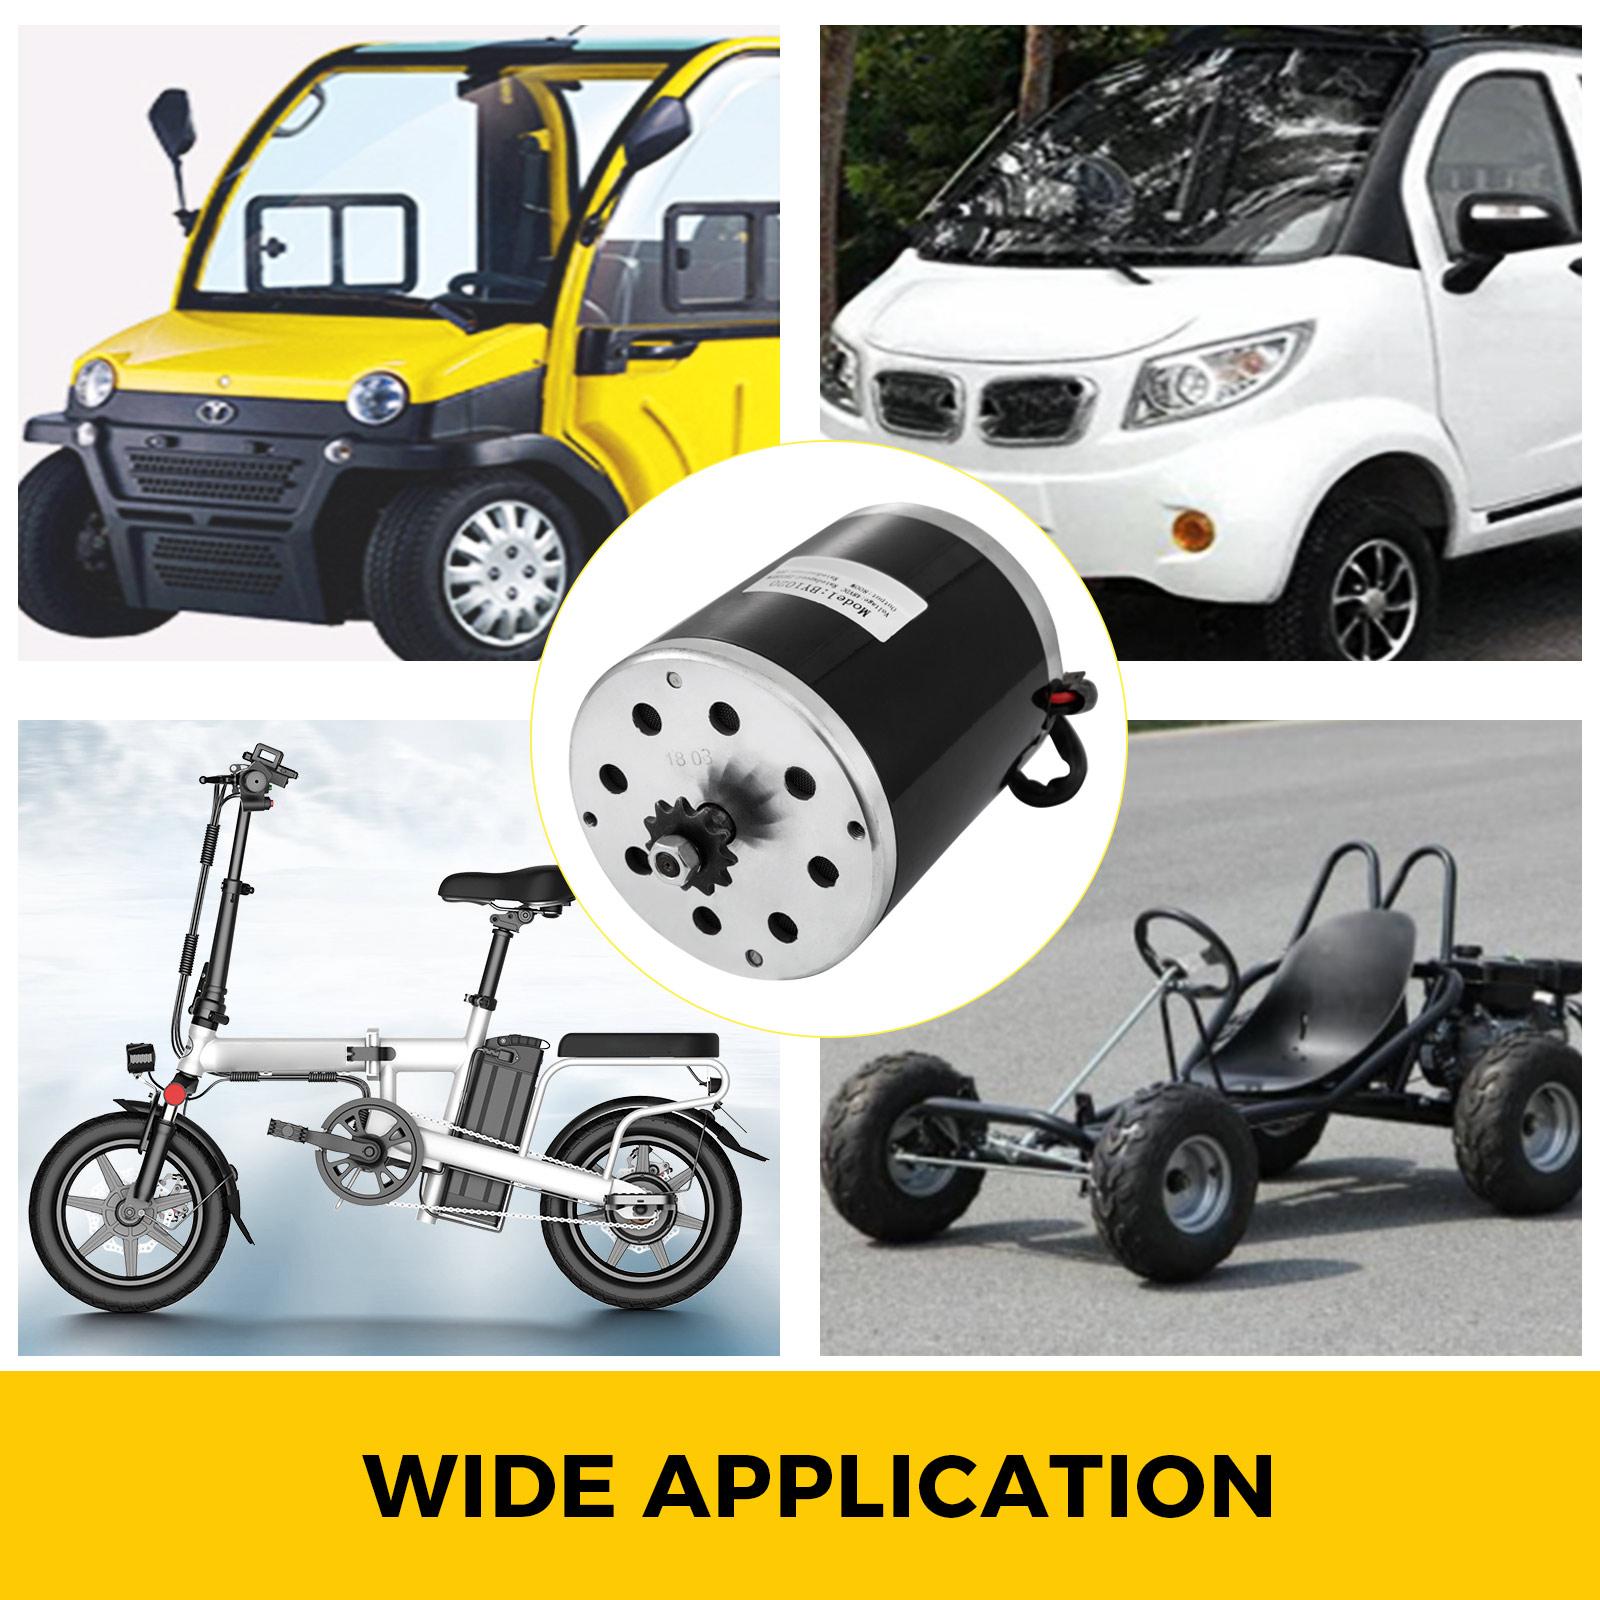 1800W-48V-DC-Brushless-Electric-Motor-Kit-f-Scooter-500-1800W-E-Bike-Go-Kart thumbnail 19